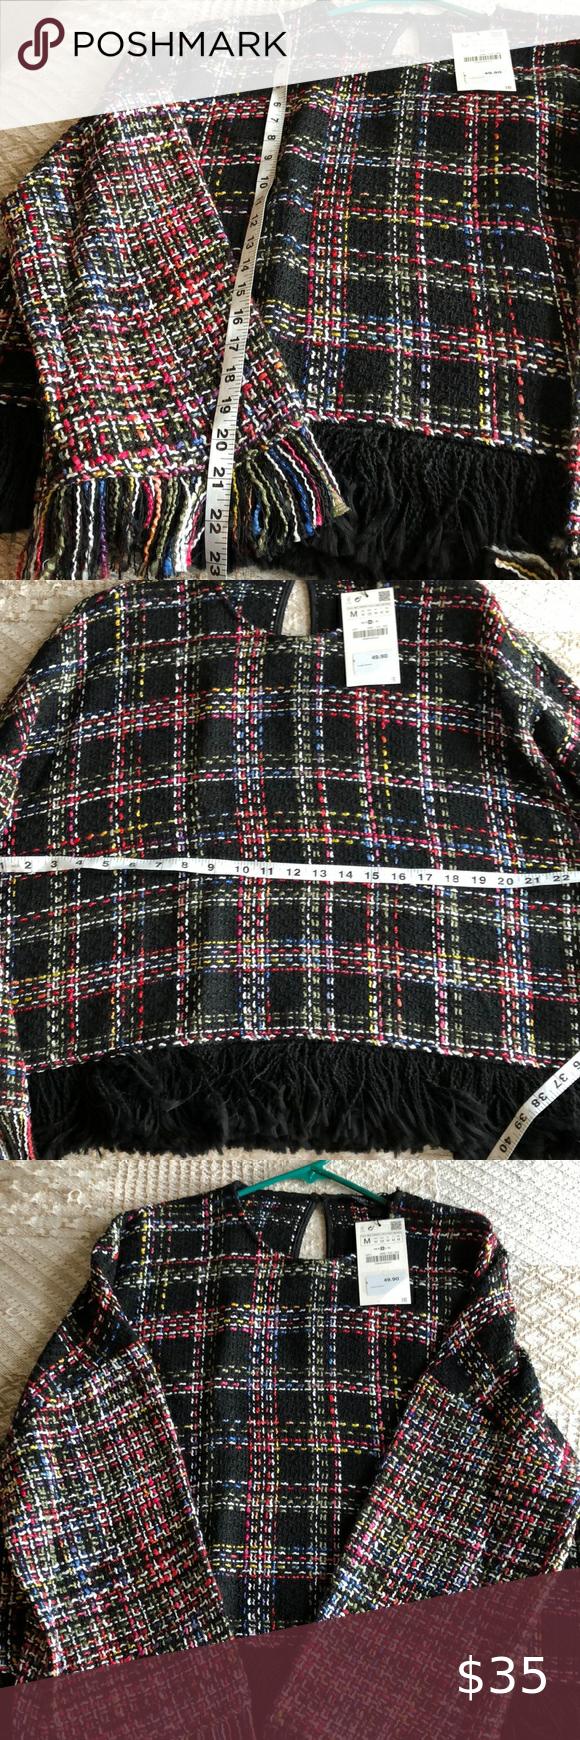 Zara Sweater Made in Turkey from 37% Acrylic, 56% Cotton, 7%, Polyester❣️ super warm.. Just beautiful ☘️ Zara Sweaters Shrugs & Ponchos #shrugsweater